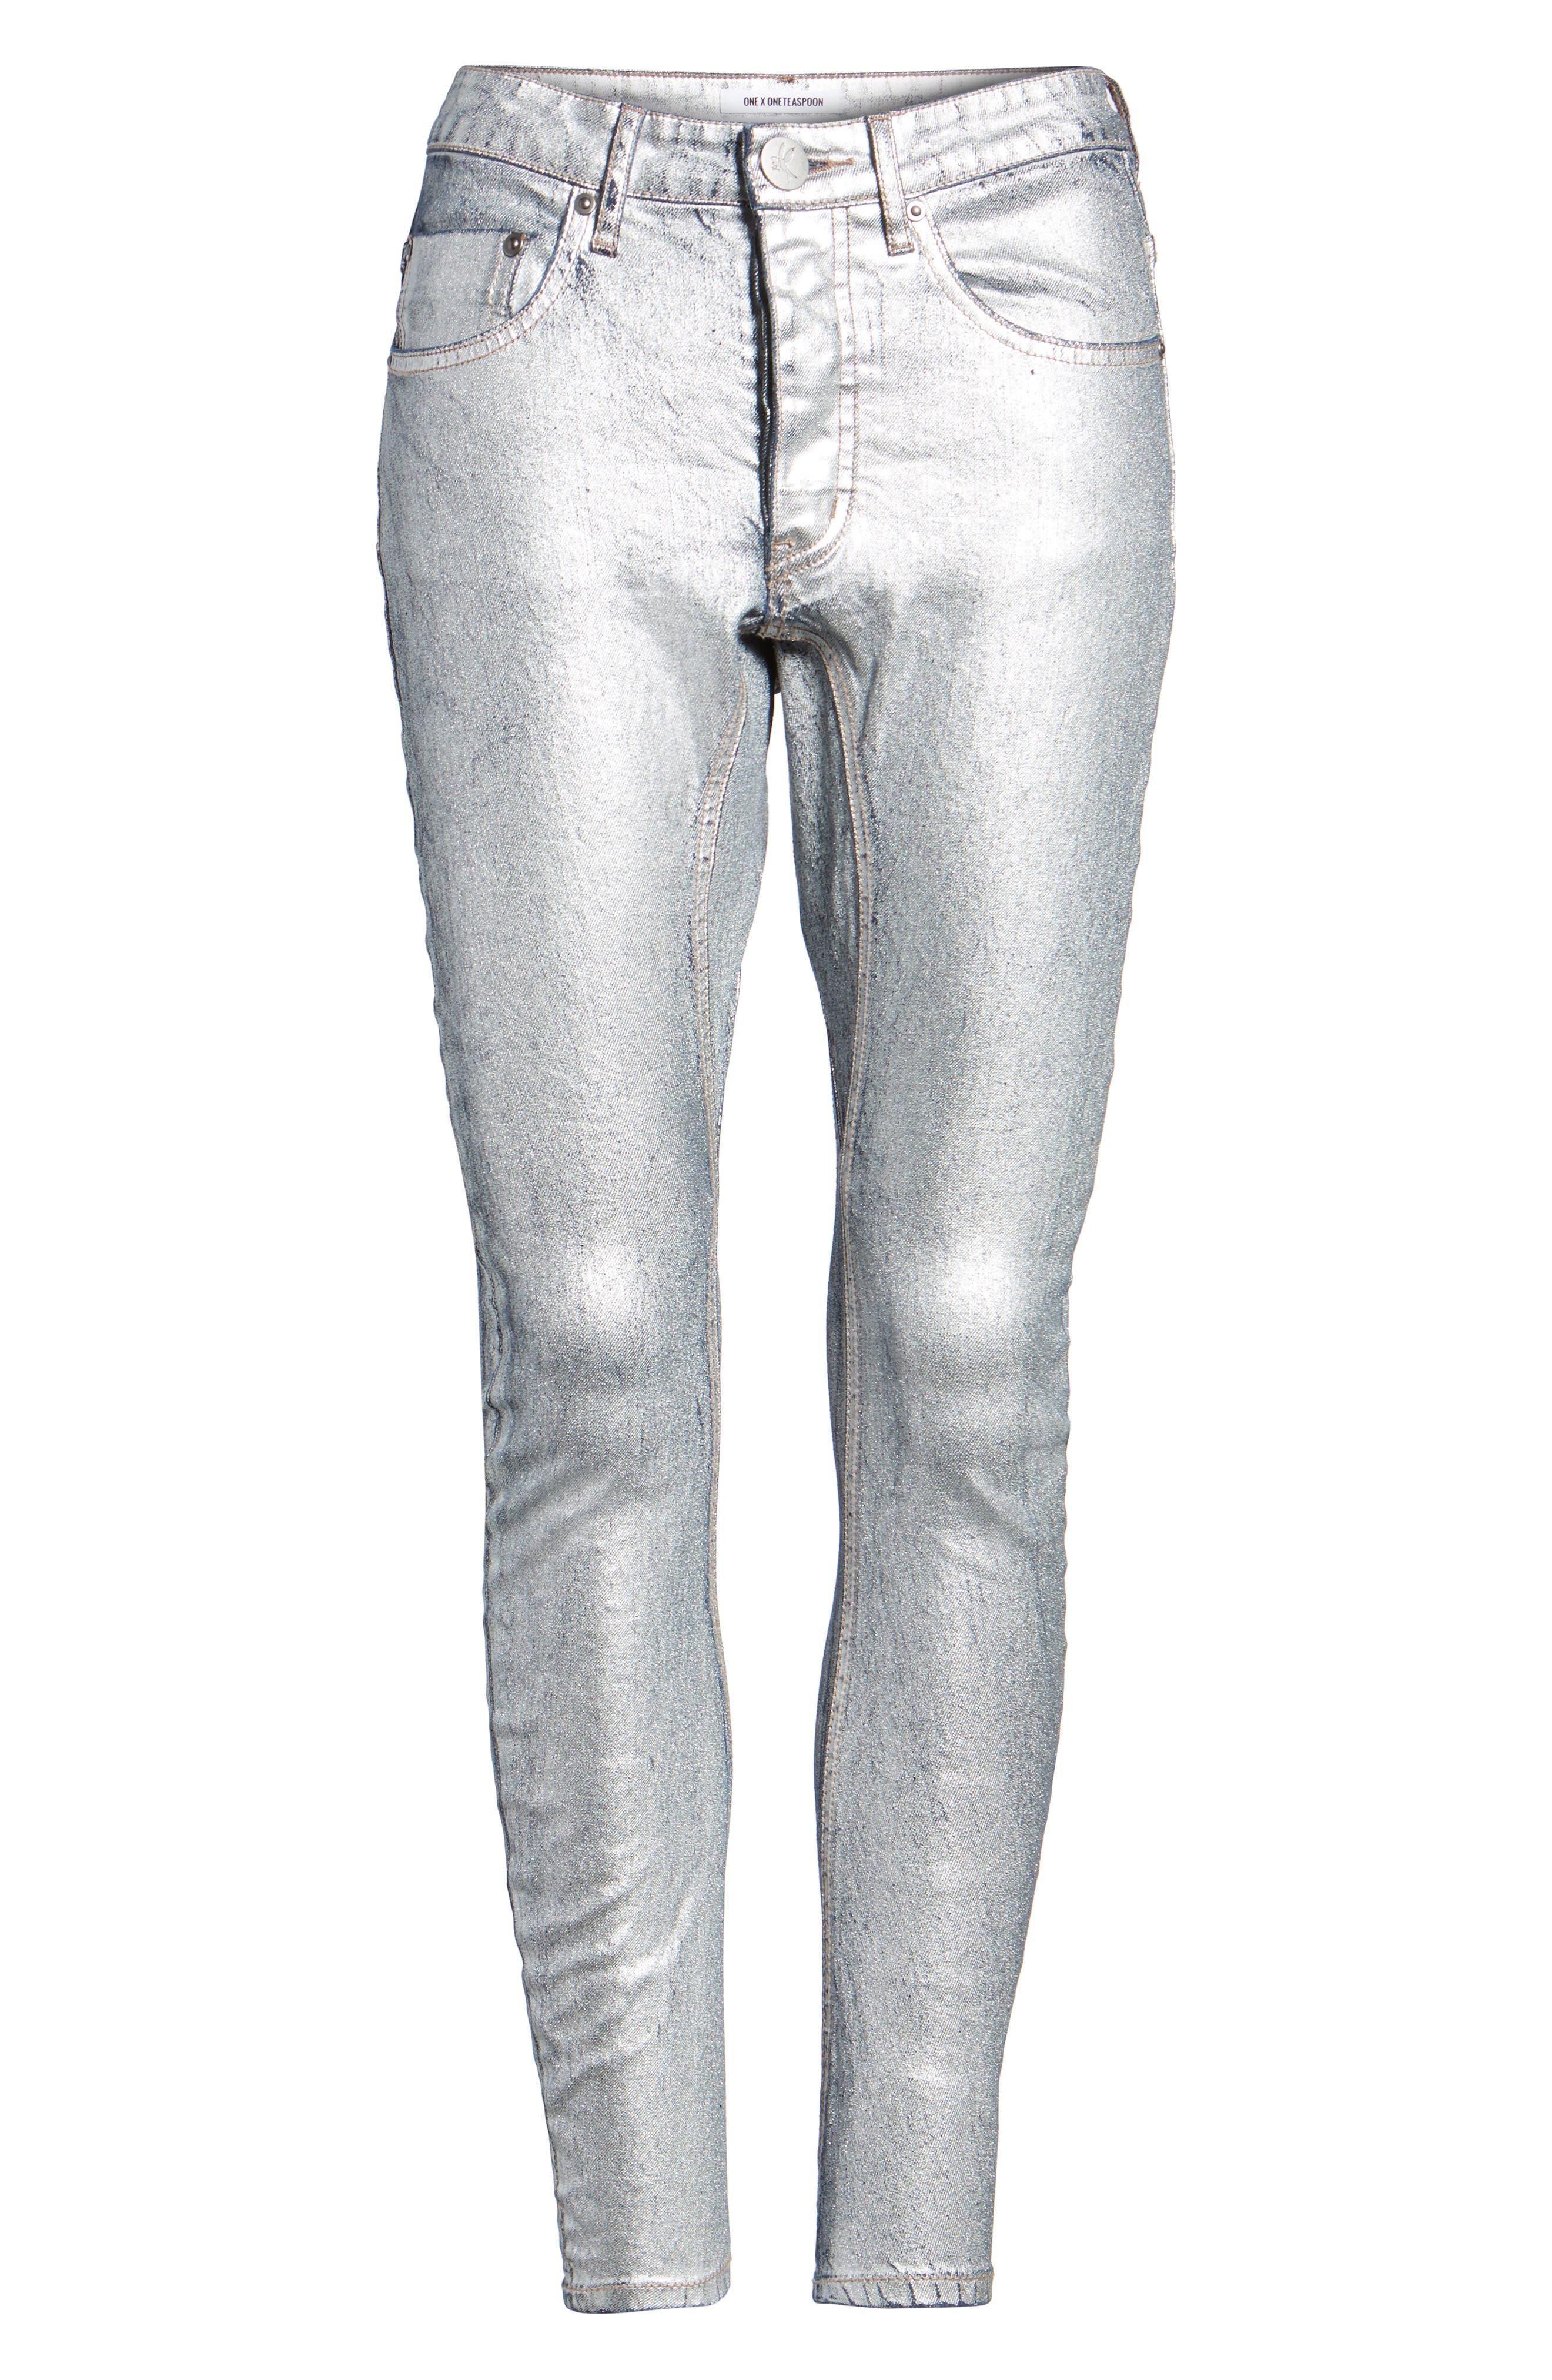 Kidds Metallic Drop Crotch Skinny Jeans,                             Alternate thumbnail 6, color,                             Nightshade